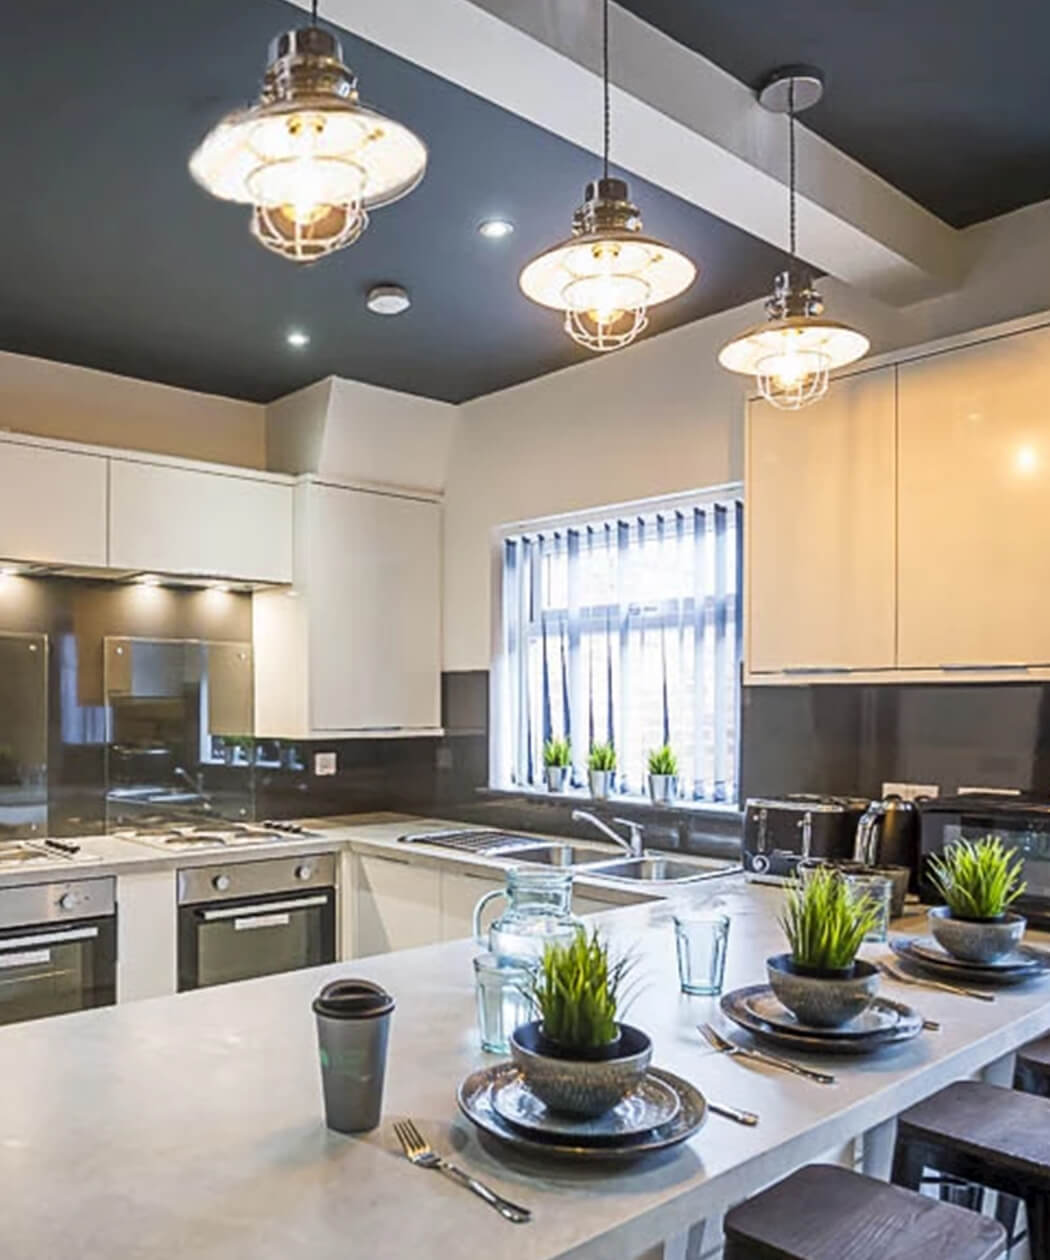 HMO Invest property developer house interior